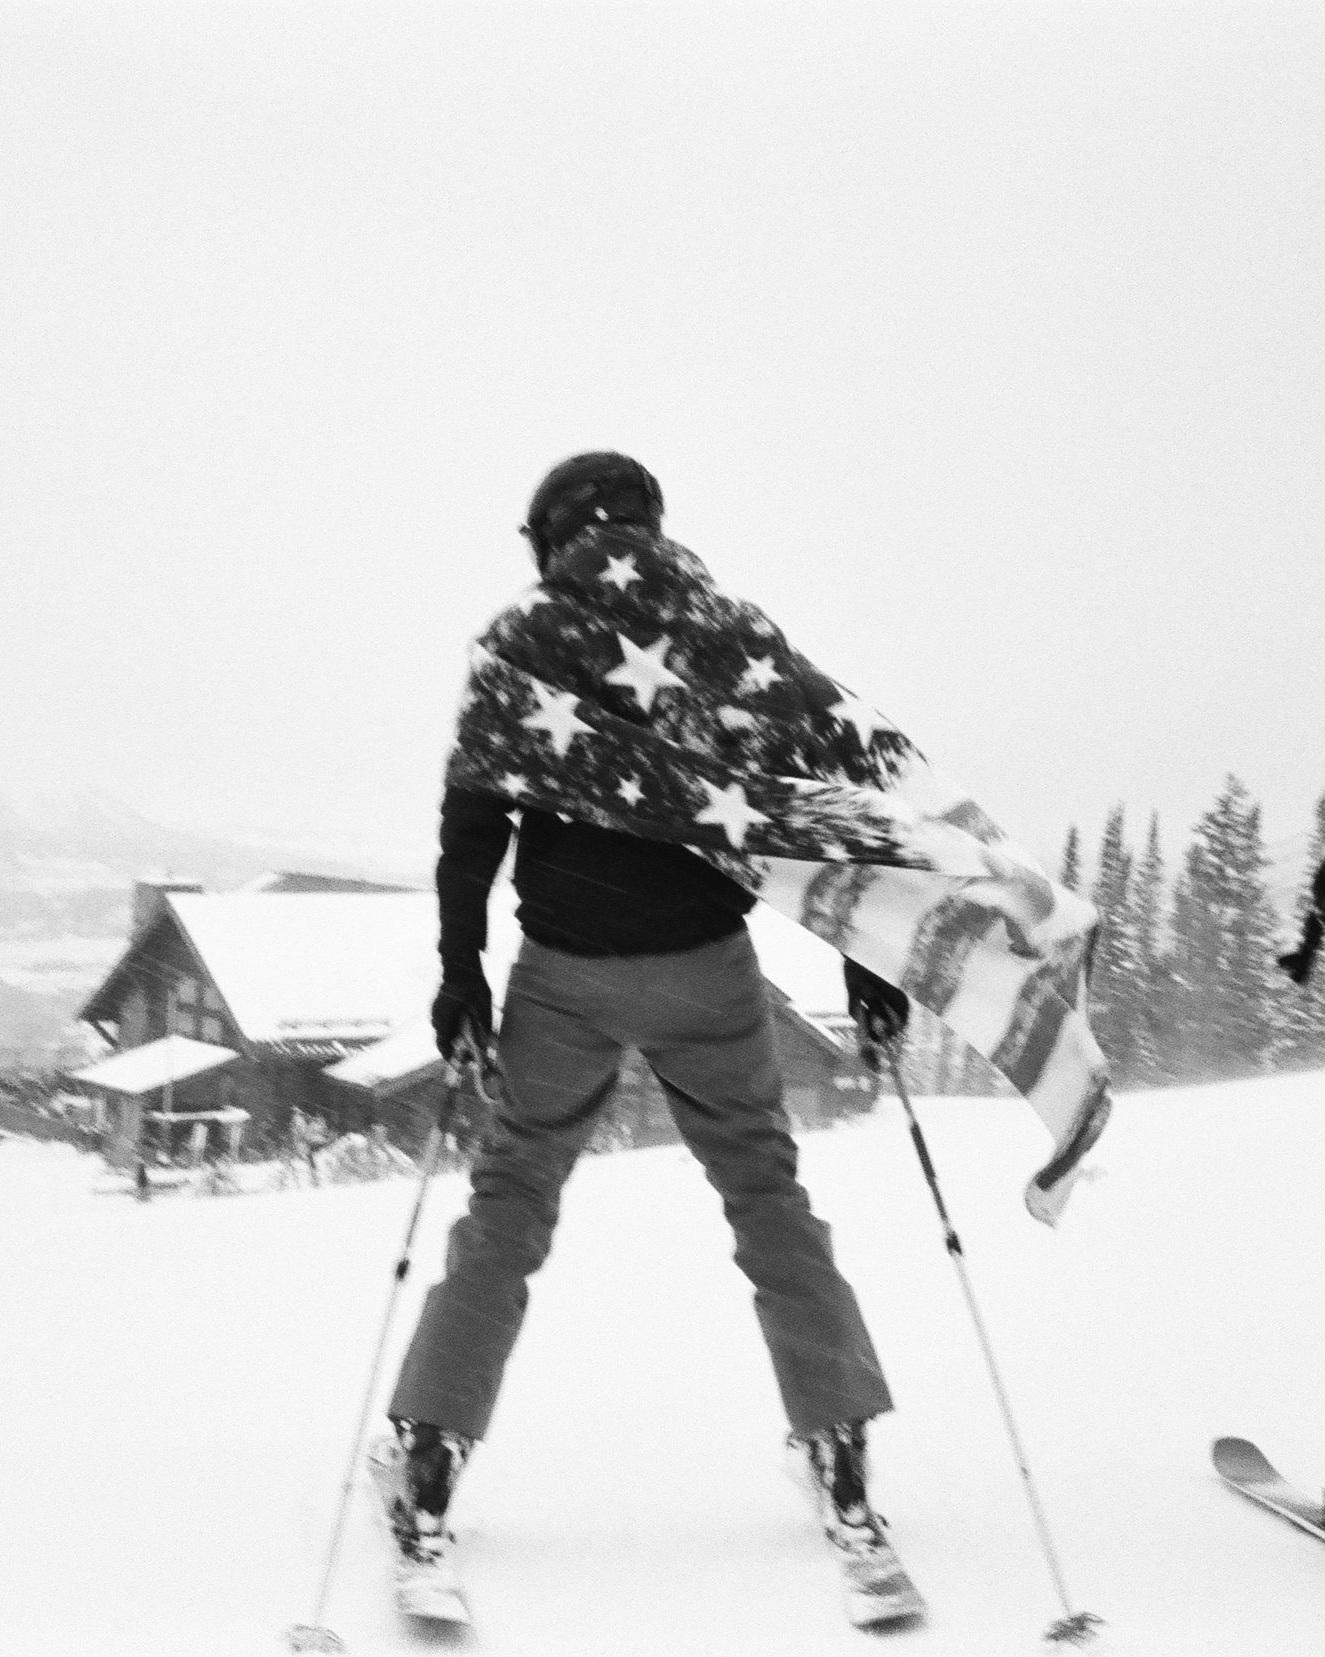 Land of the Ski